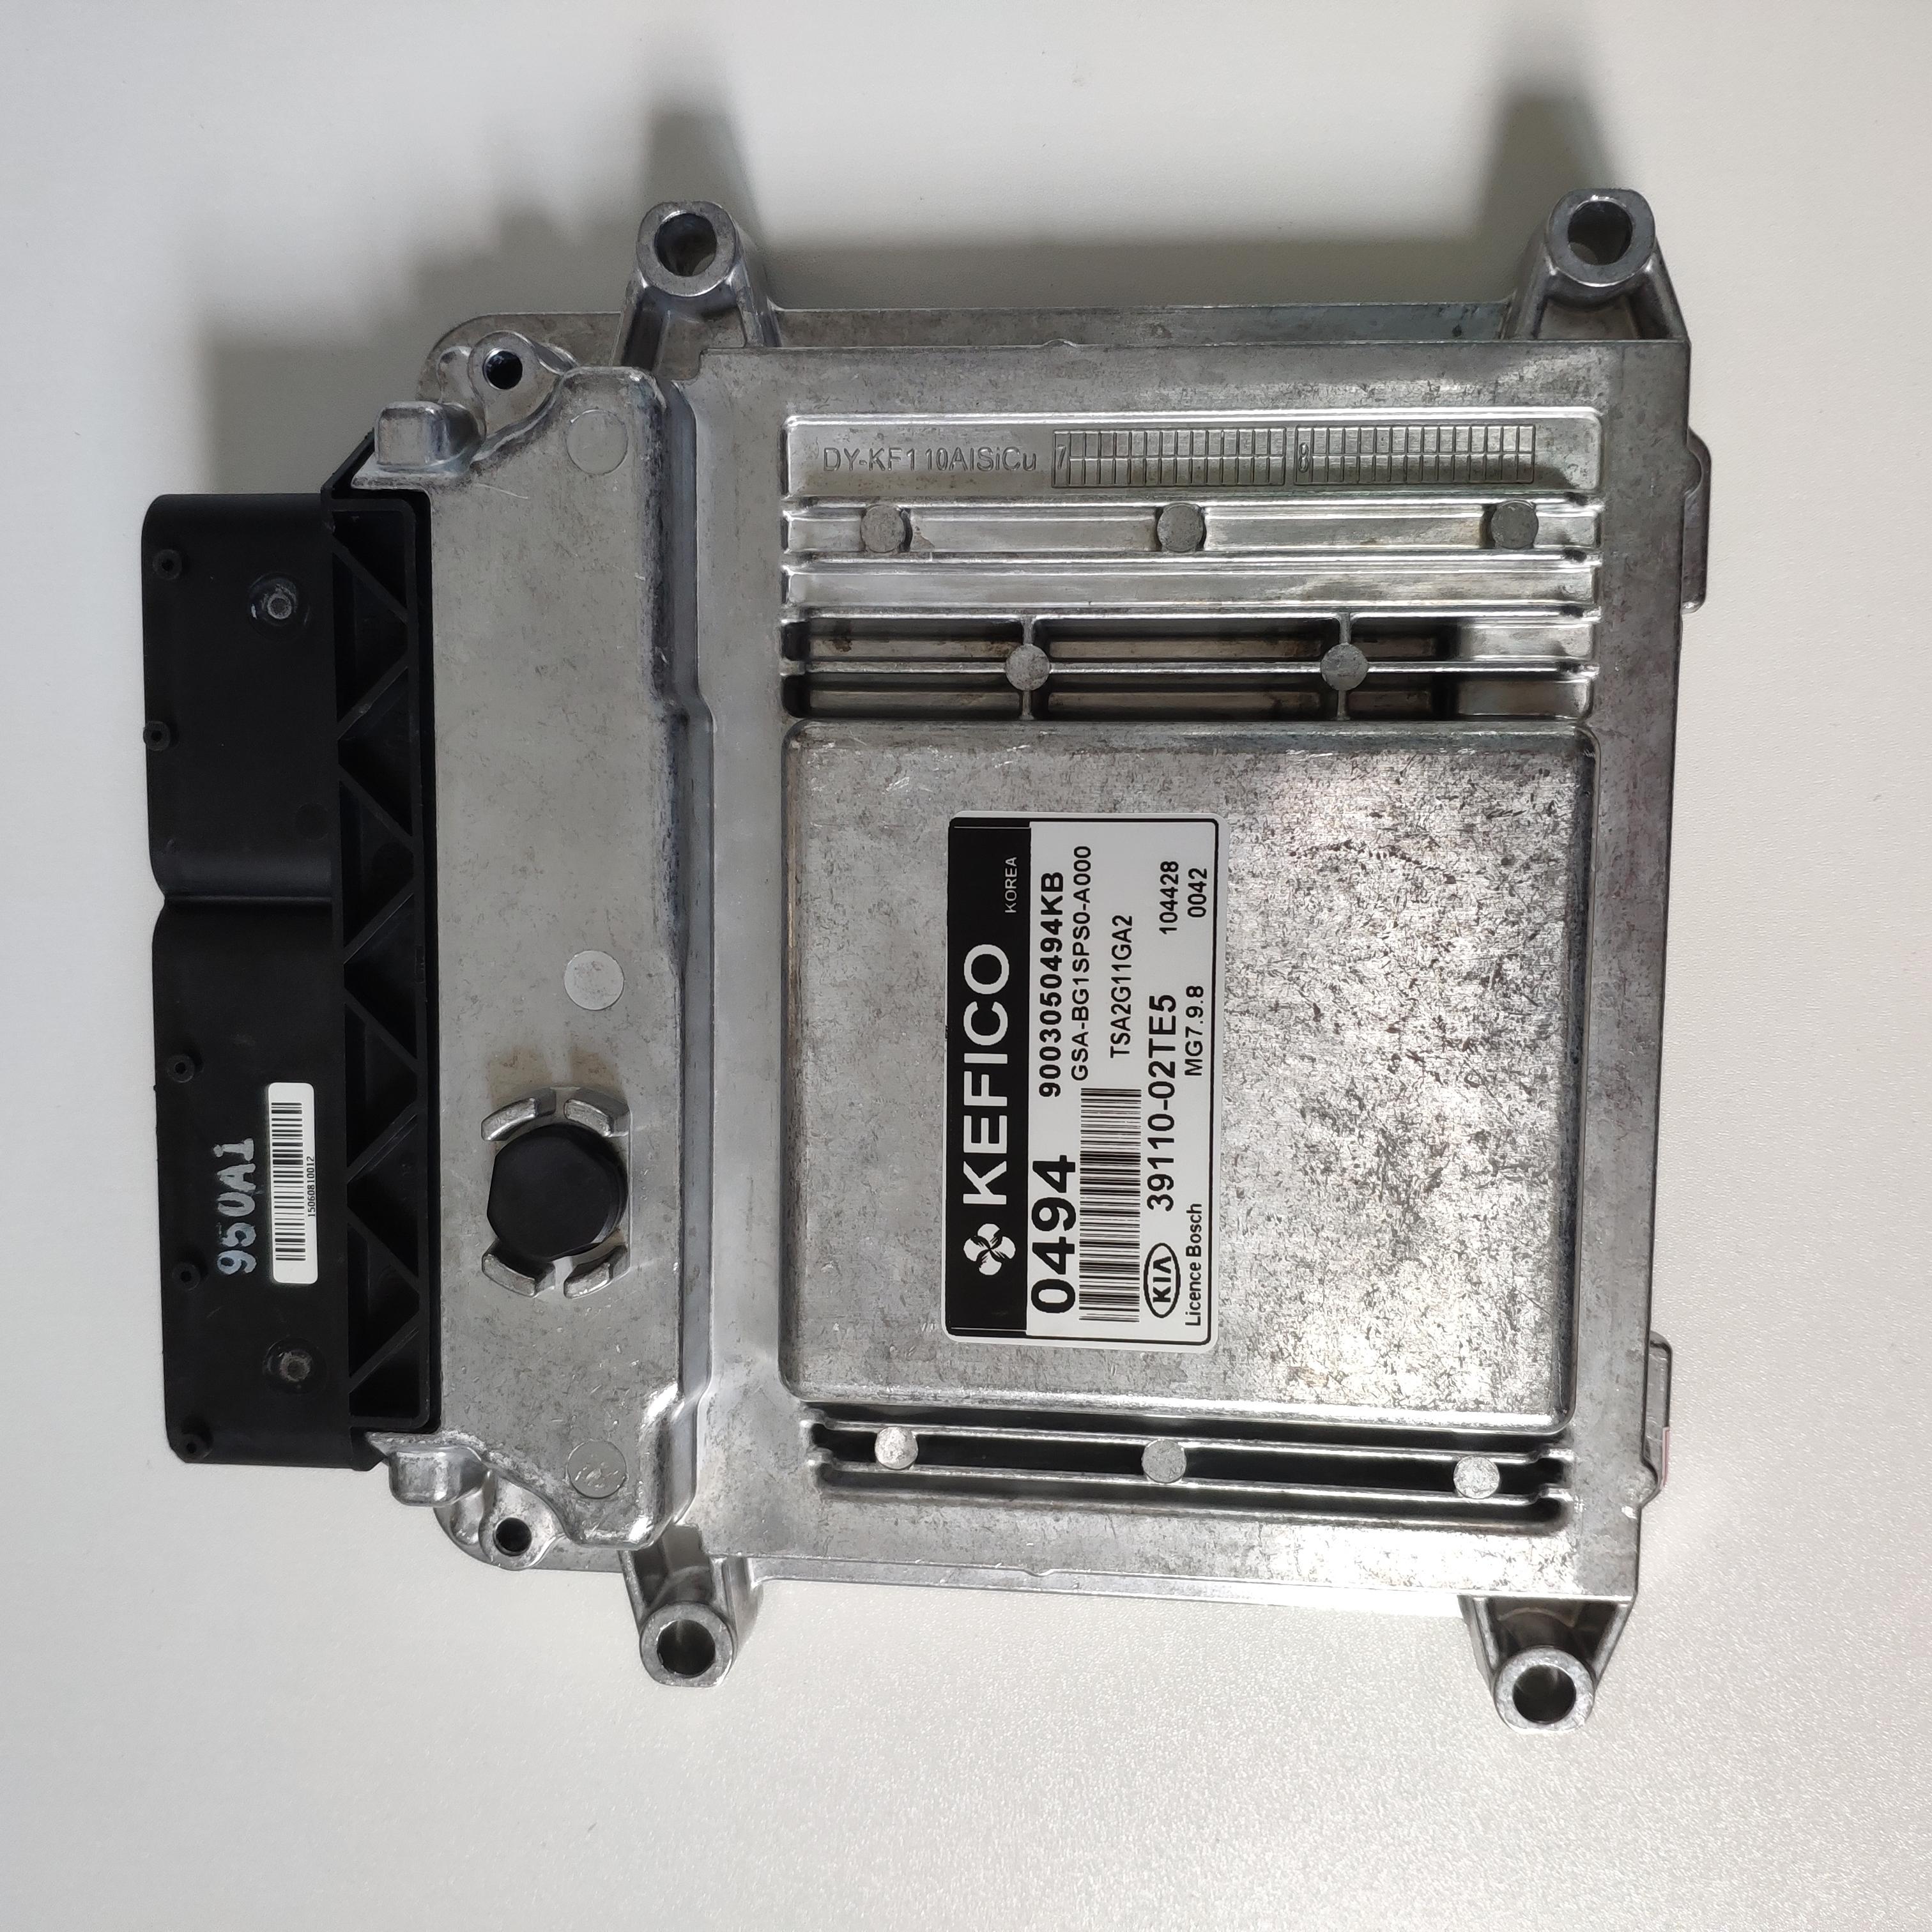 for Hyundai KIA electronic Control Unit ECU 39110-02TE5